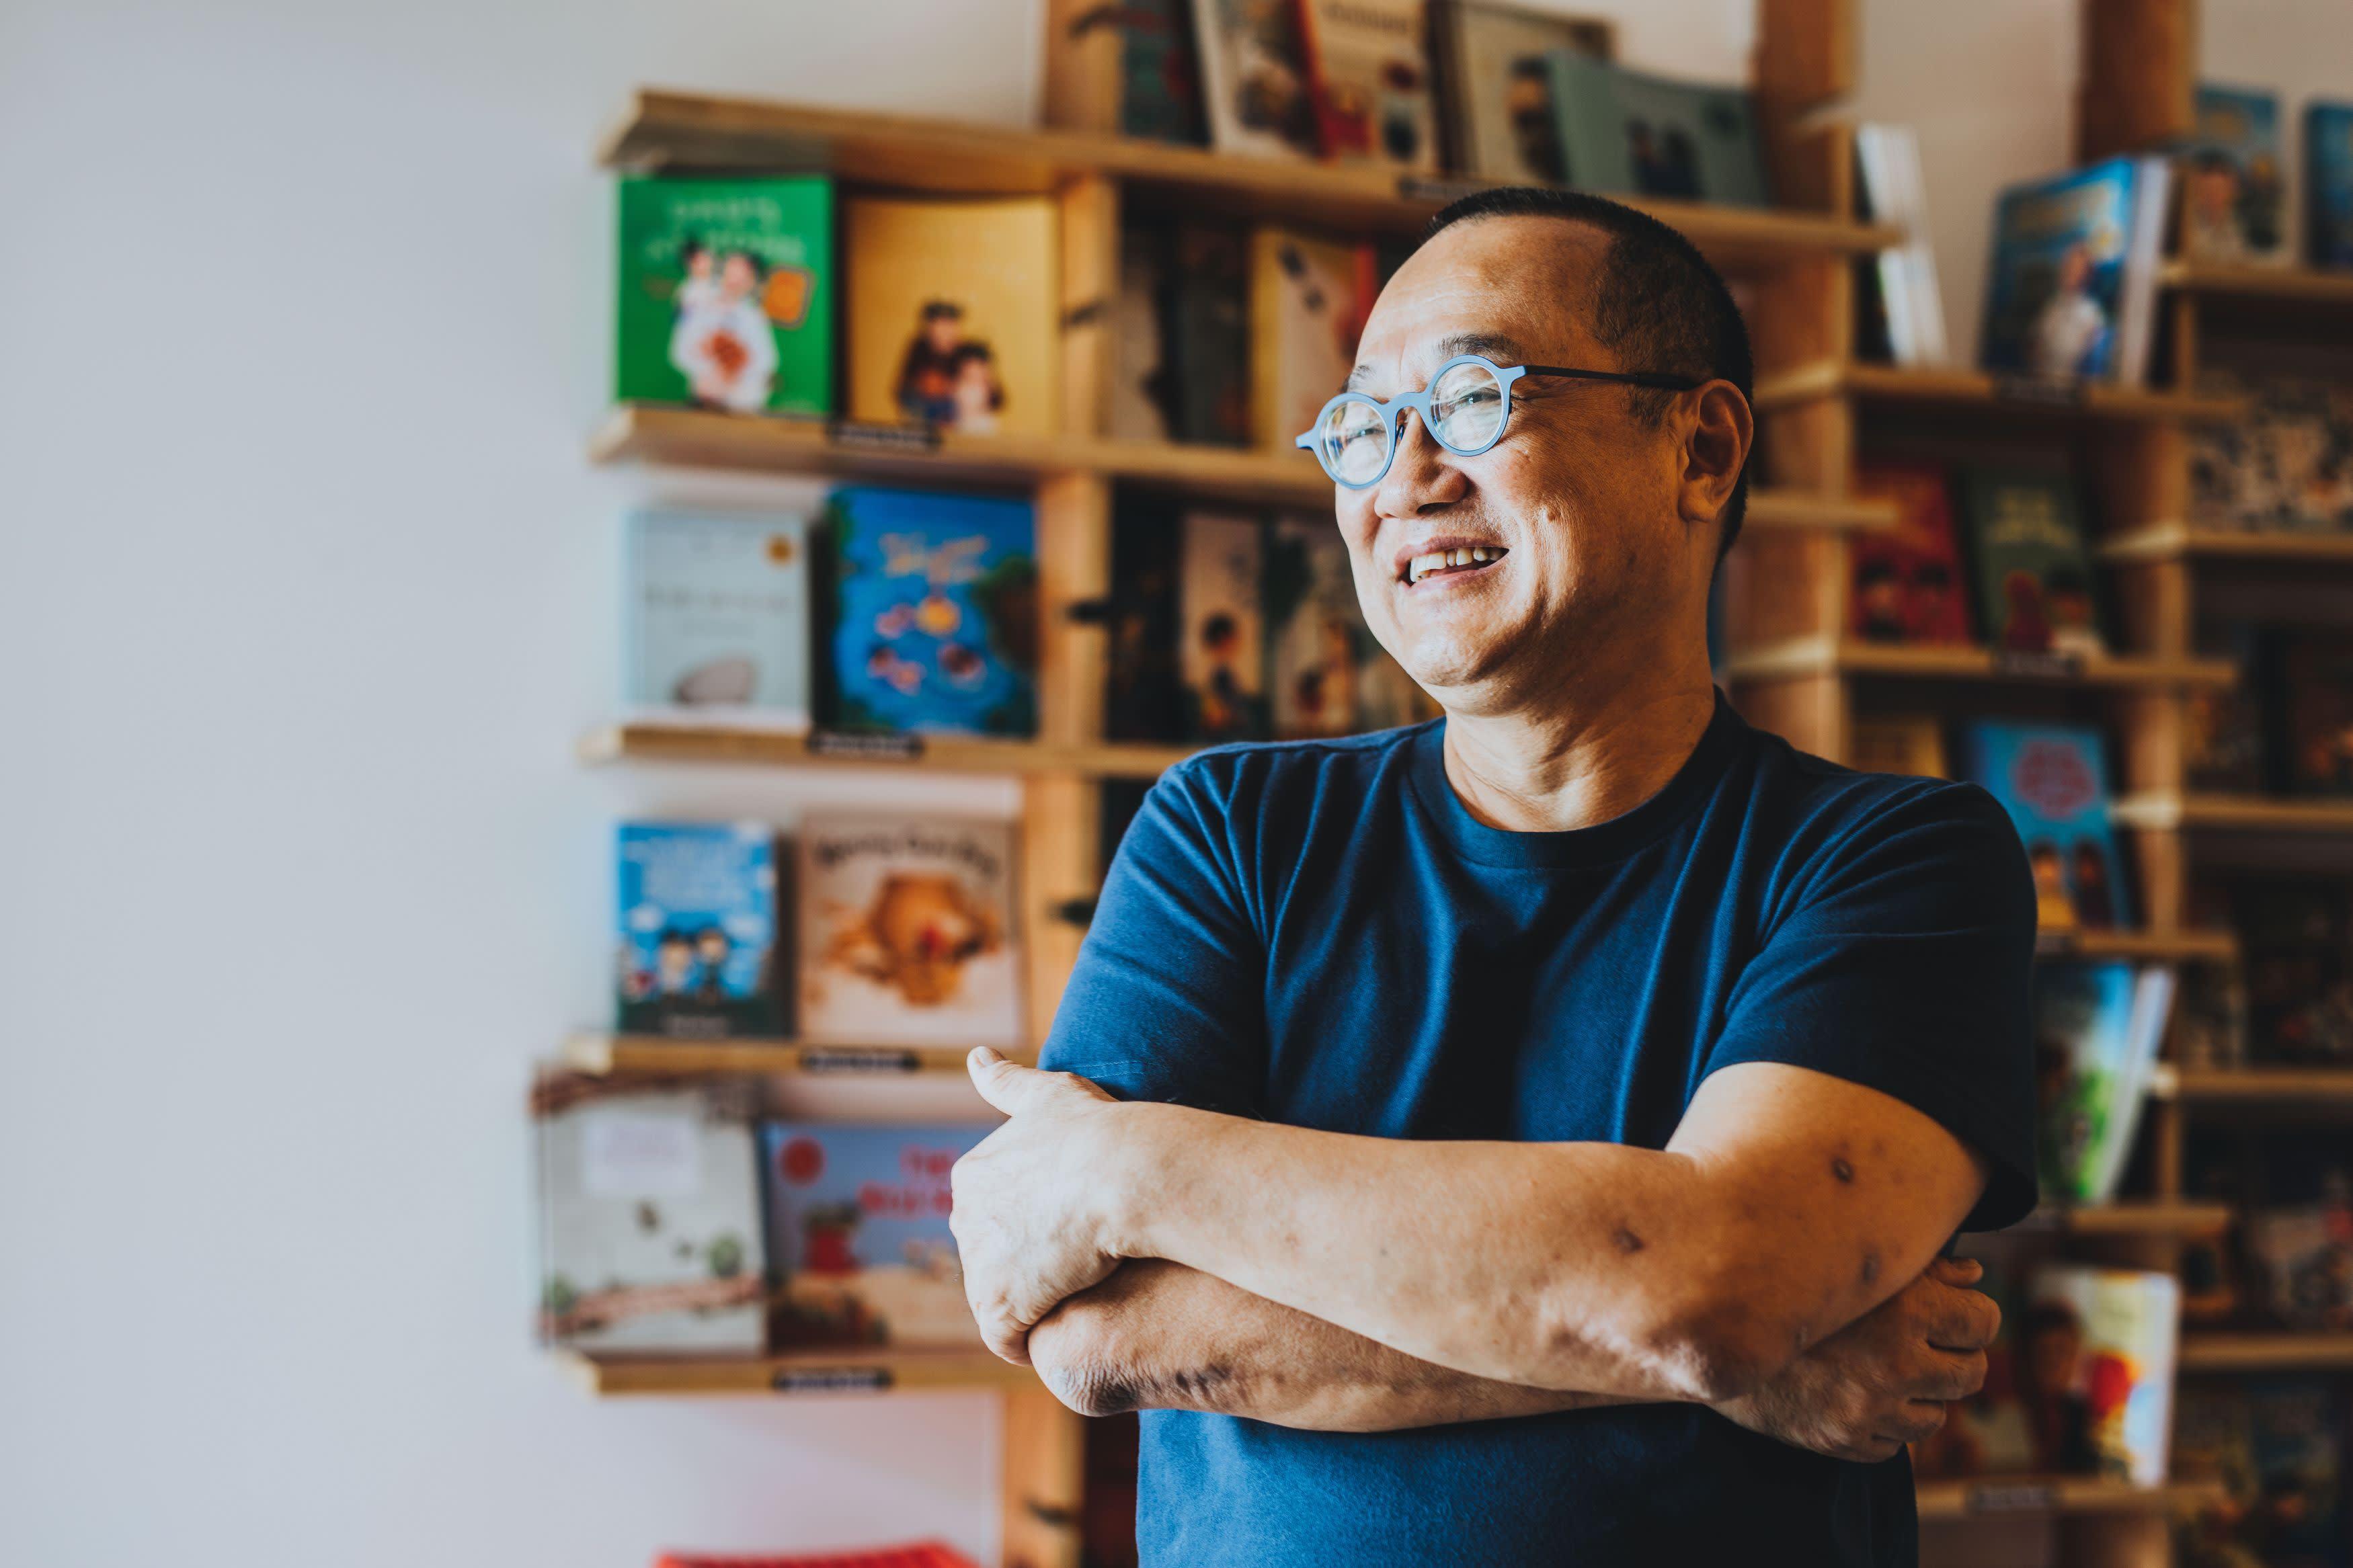 Singapore's rebel bookseller seeks new narrative - Nikkei